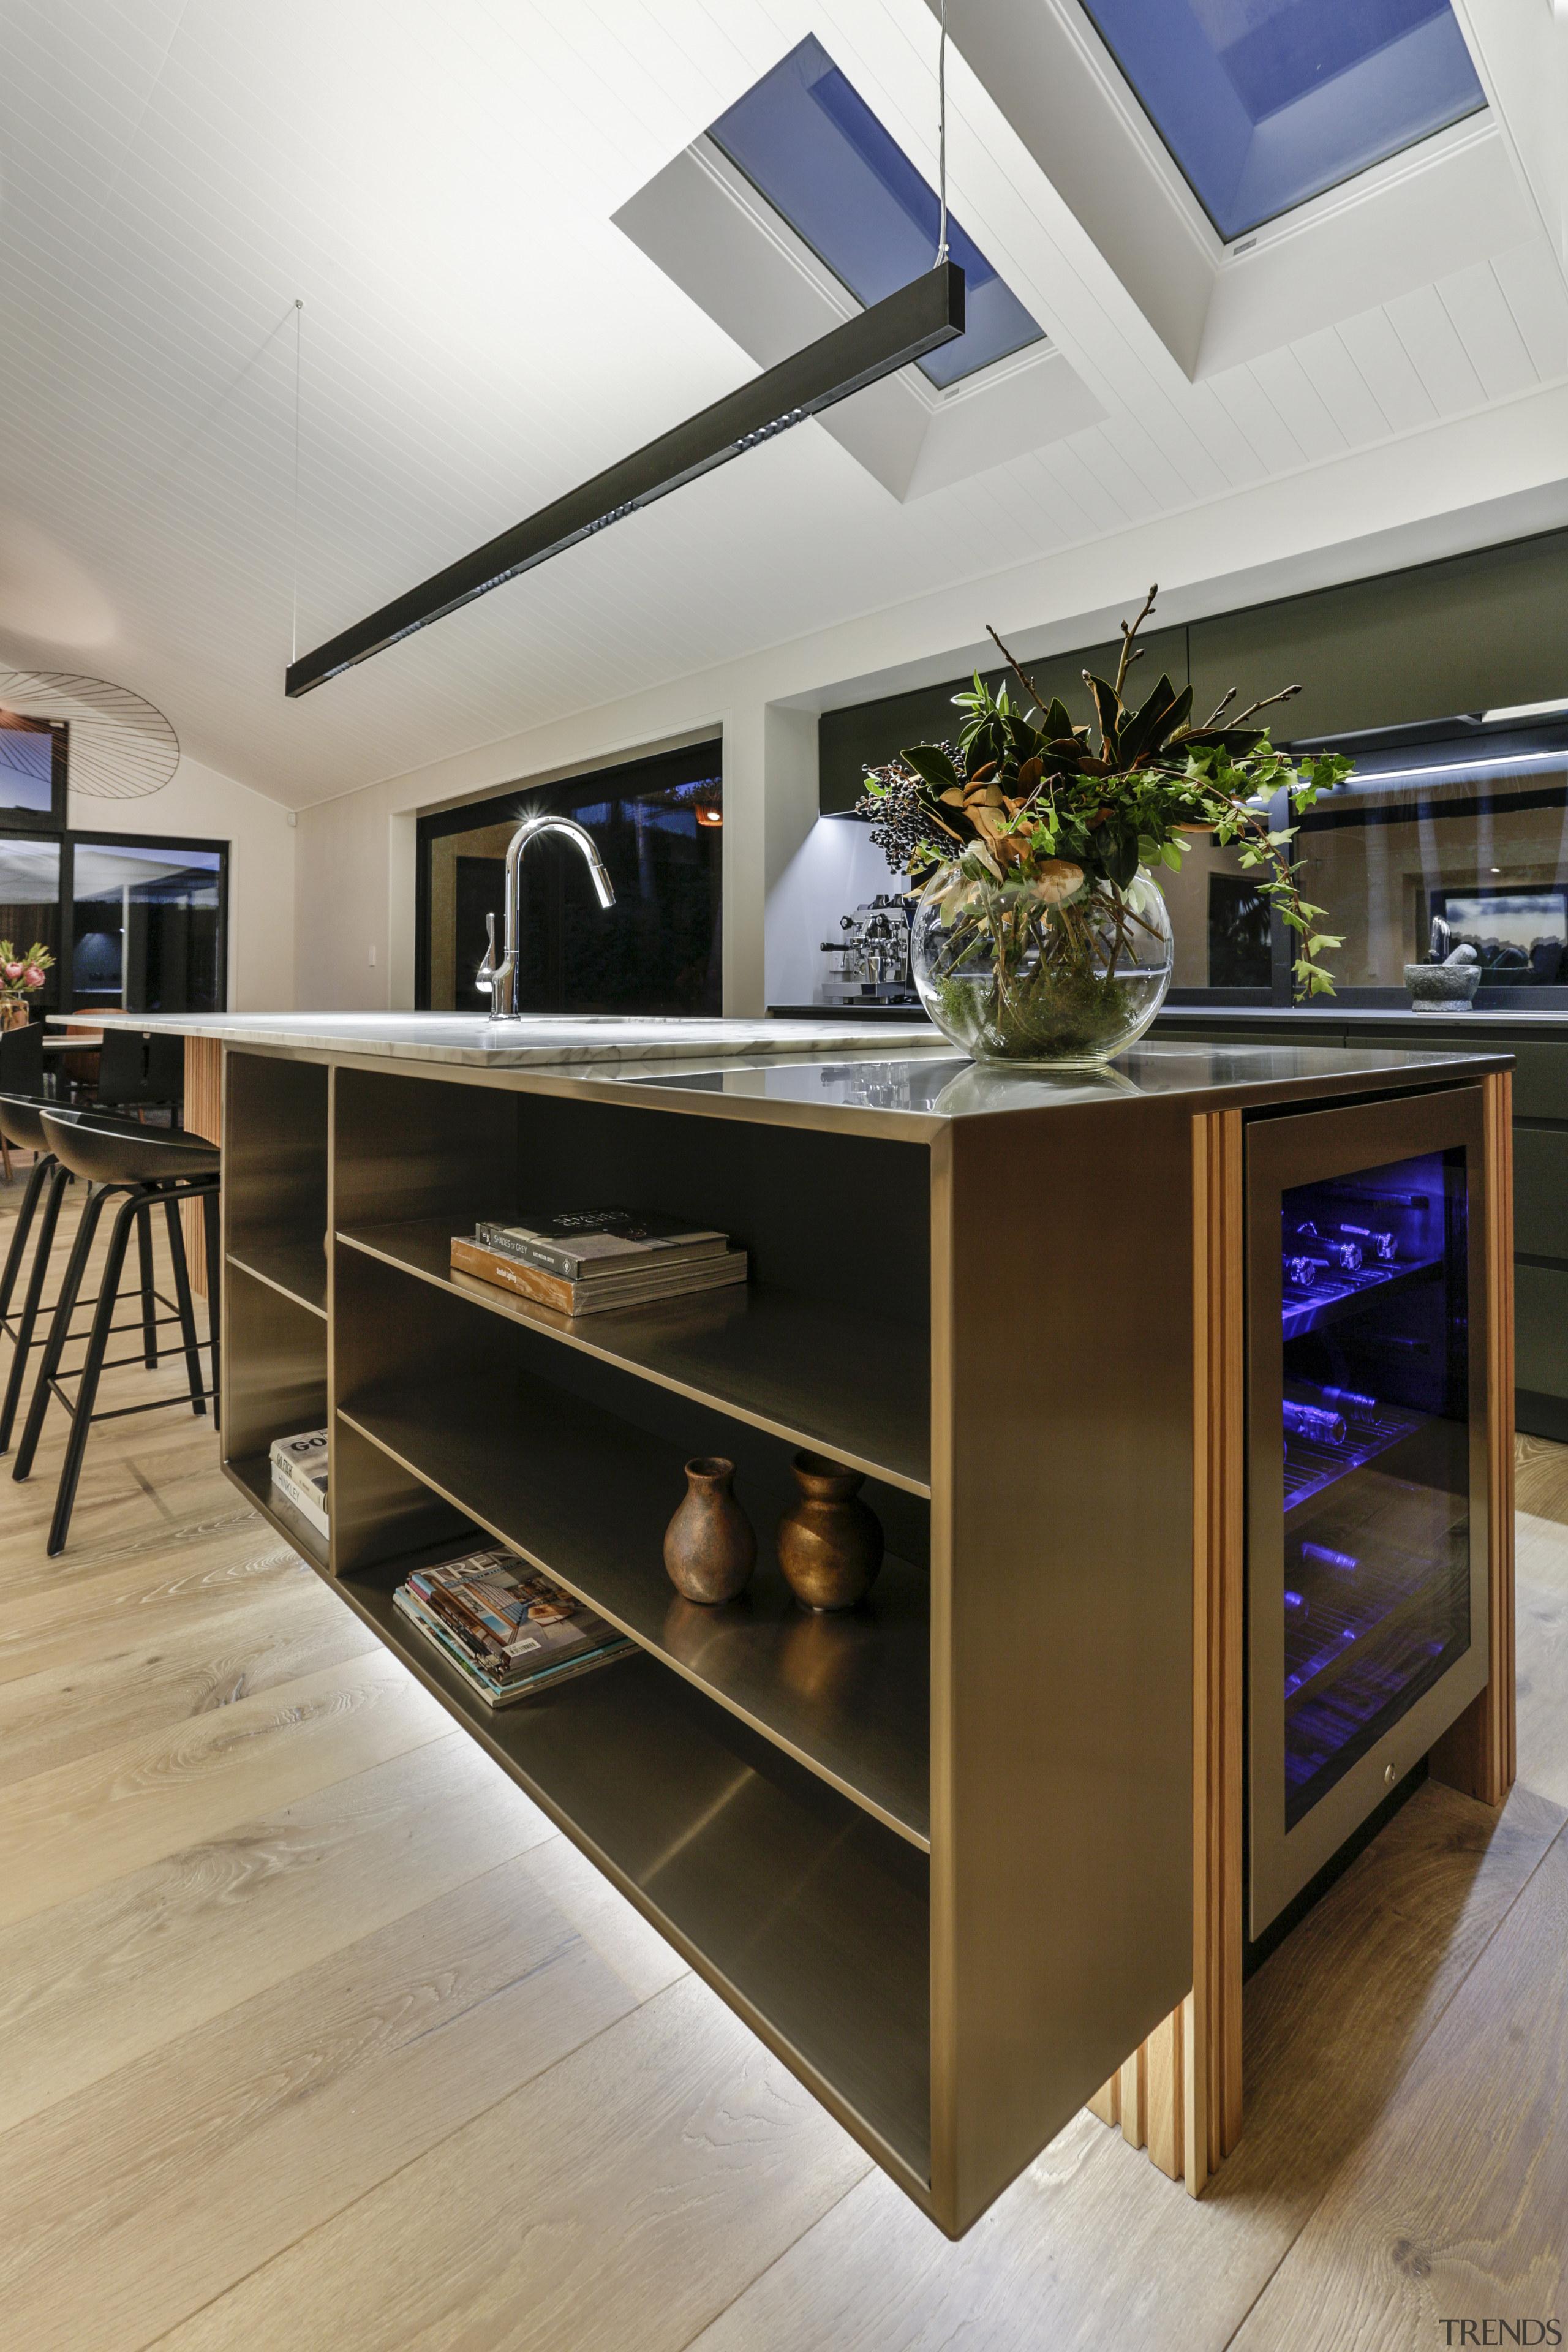 Half Moon Bay - countertop | furniture | countertop, furniture, interior design, kitchen, brown, gray